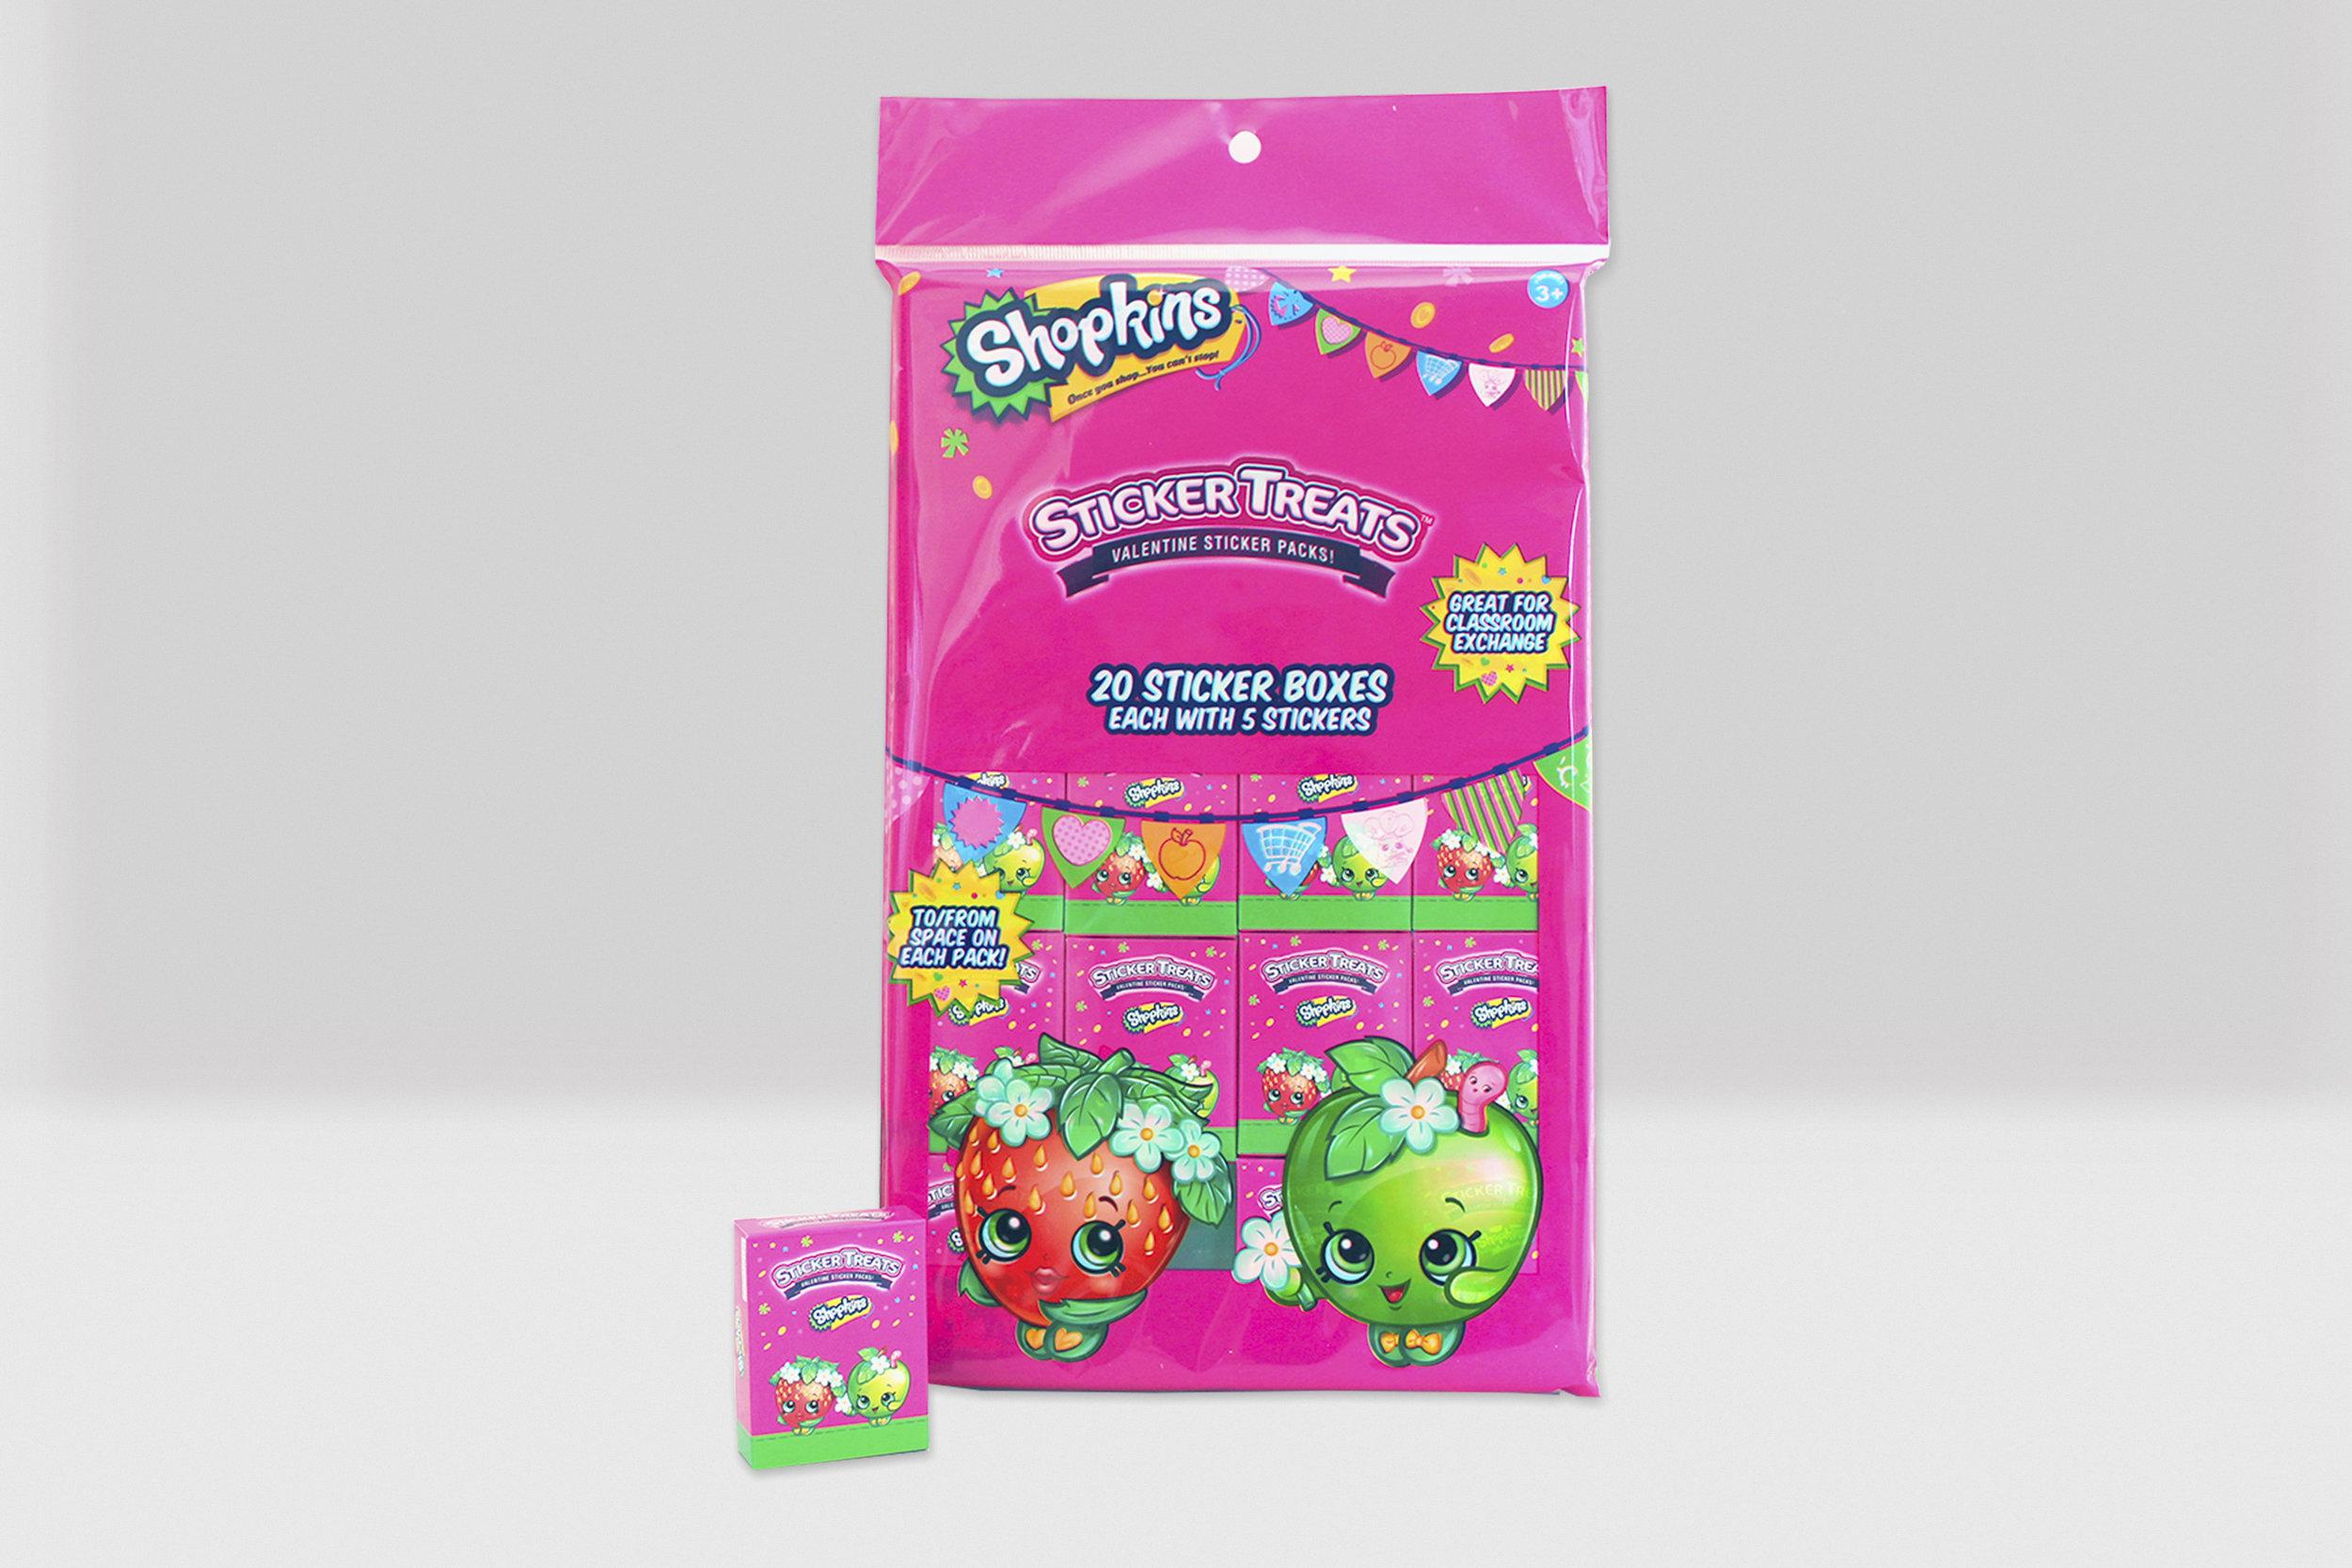 Shopkins-sticker-boxes.jpg